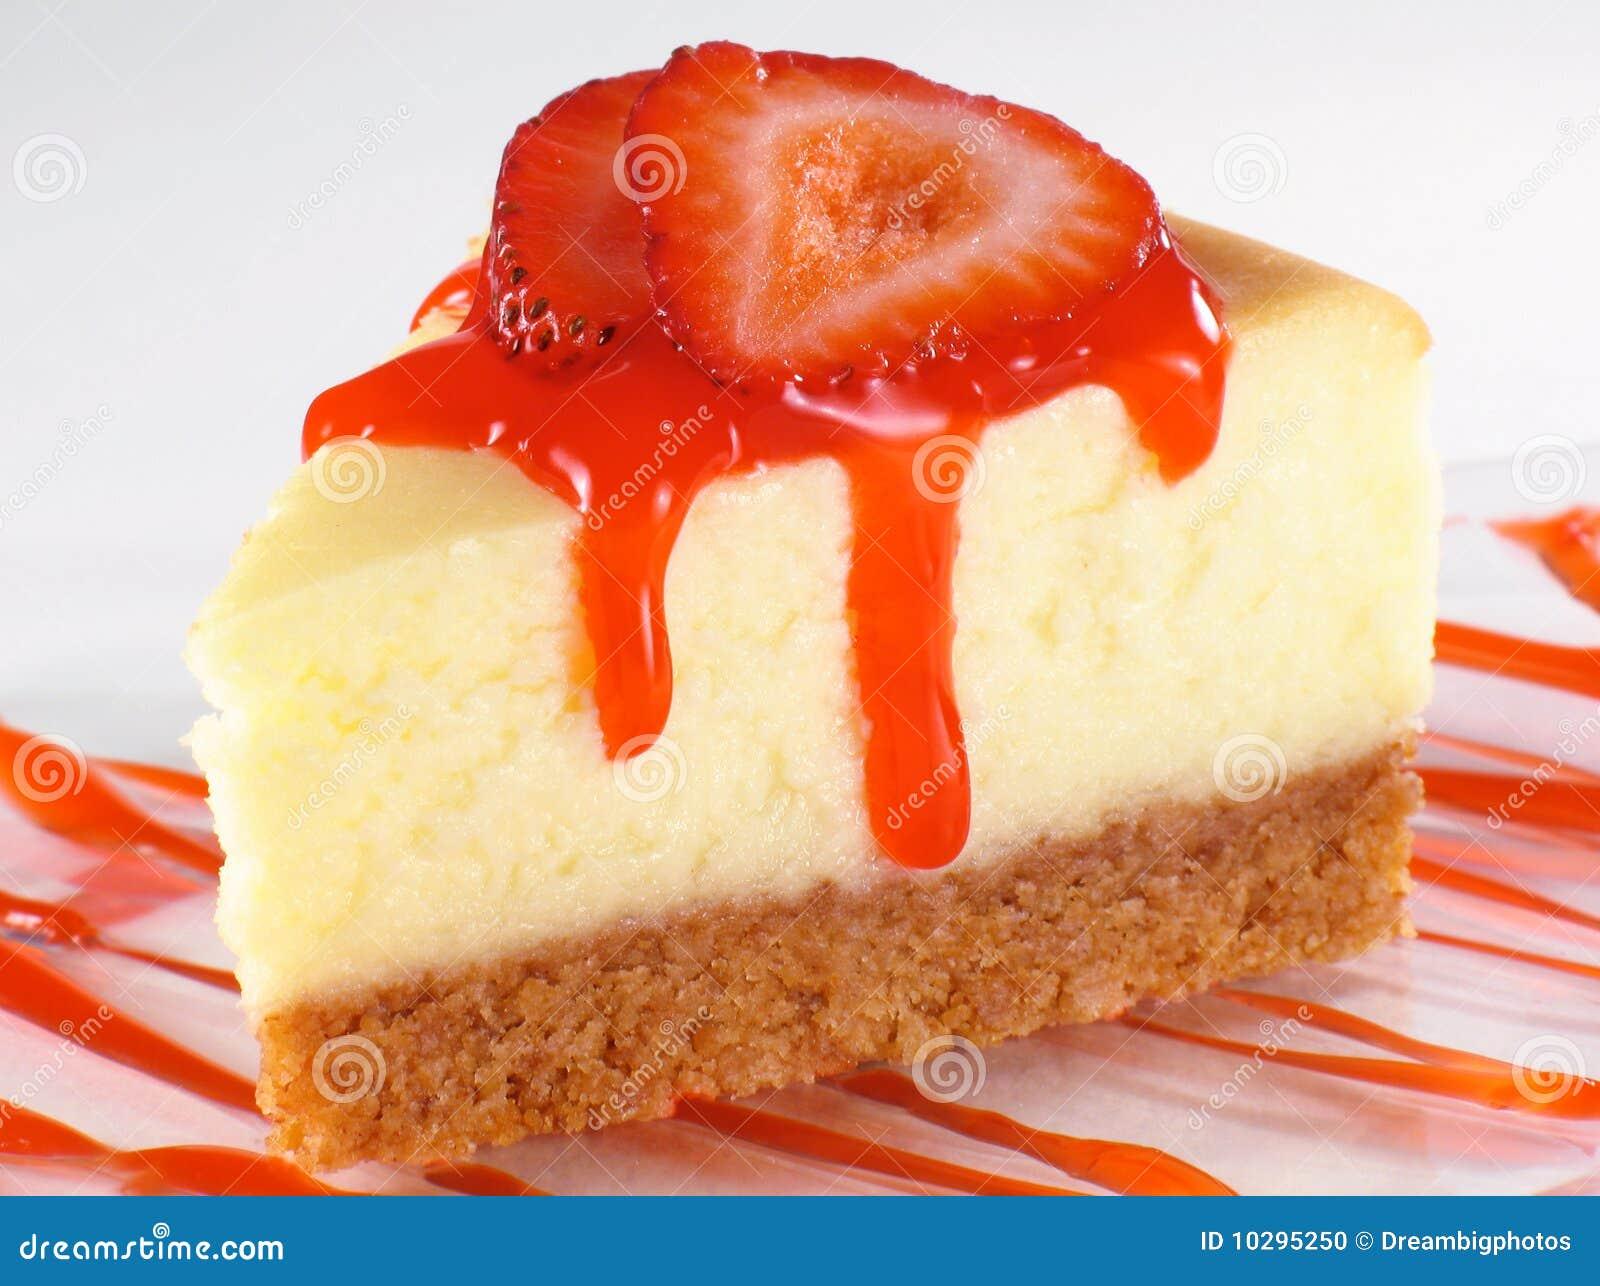 Cheesecake And Strawberry Sauce Stock Photo - Image: 10295250